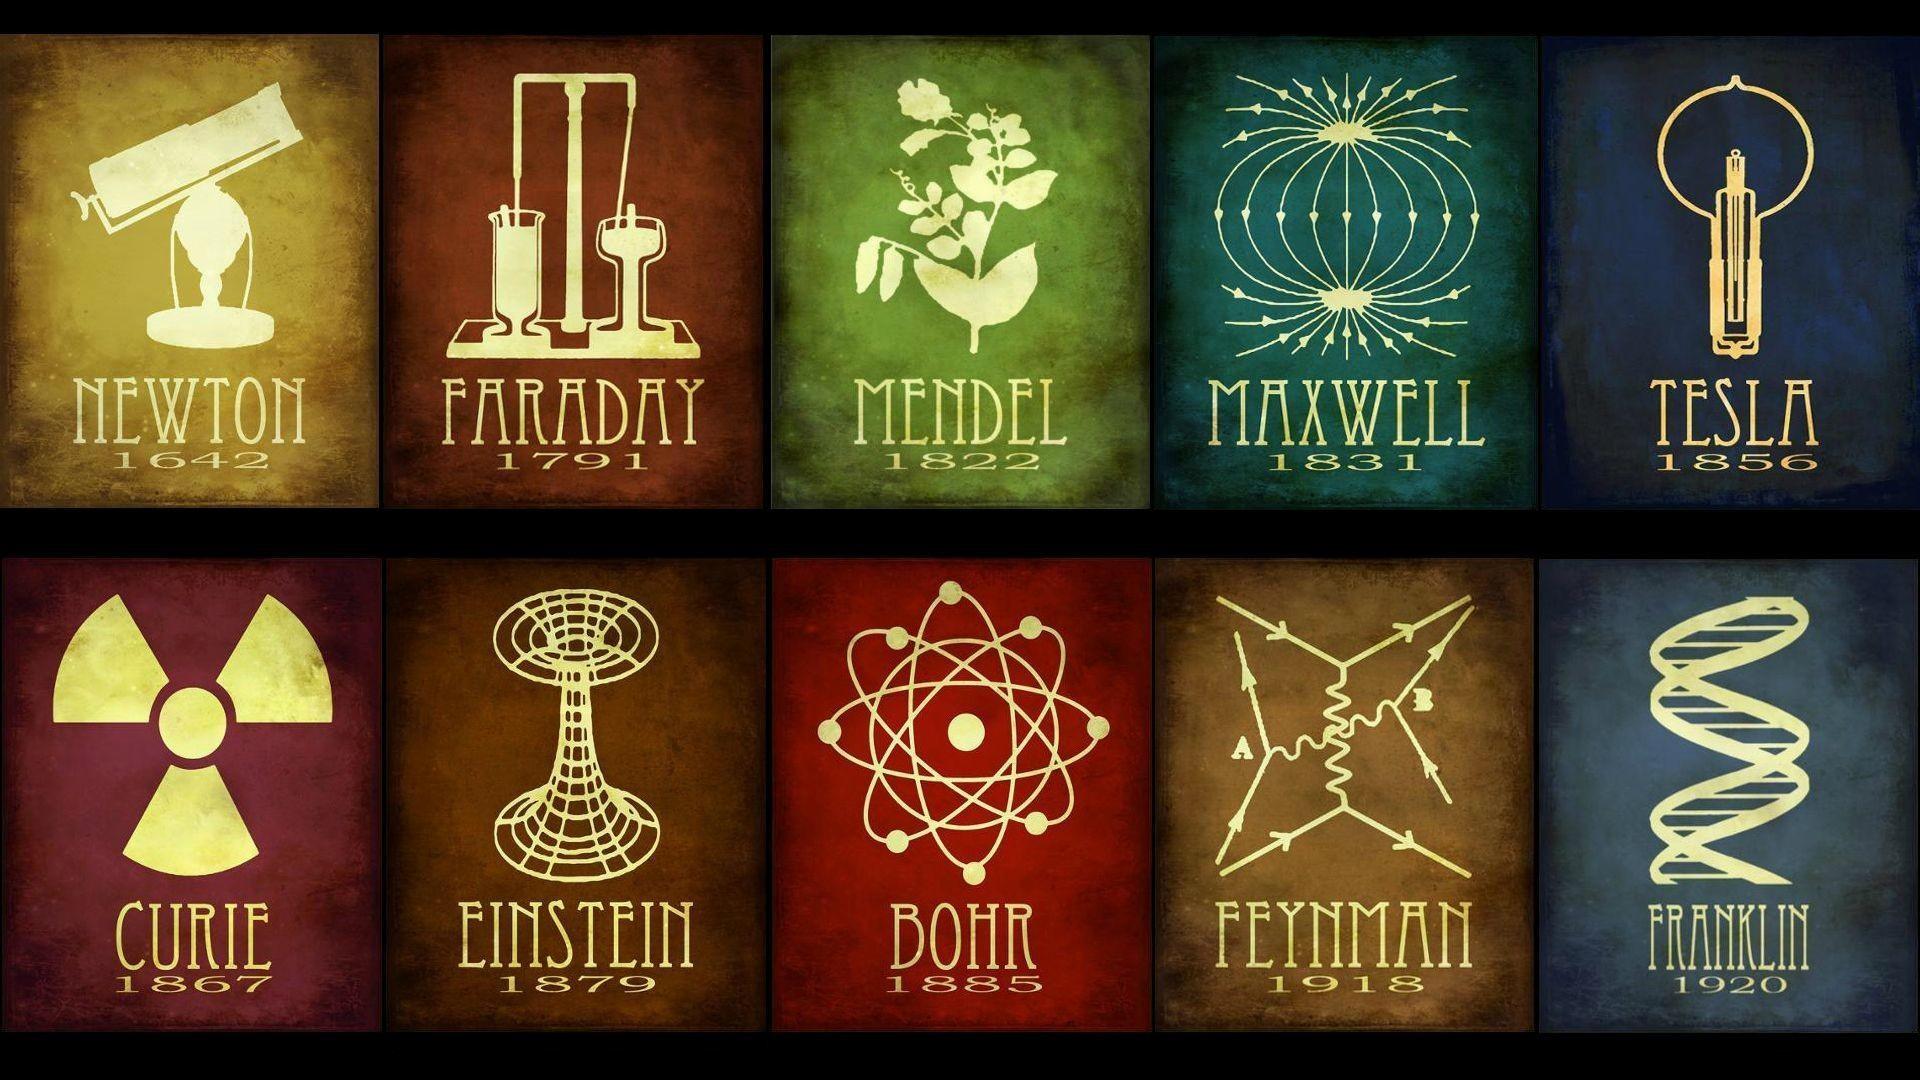 wallpaper.wiki-Chemistry-Wallpaper-Free-Download-PIC-WPC006937